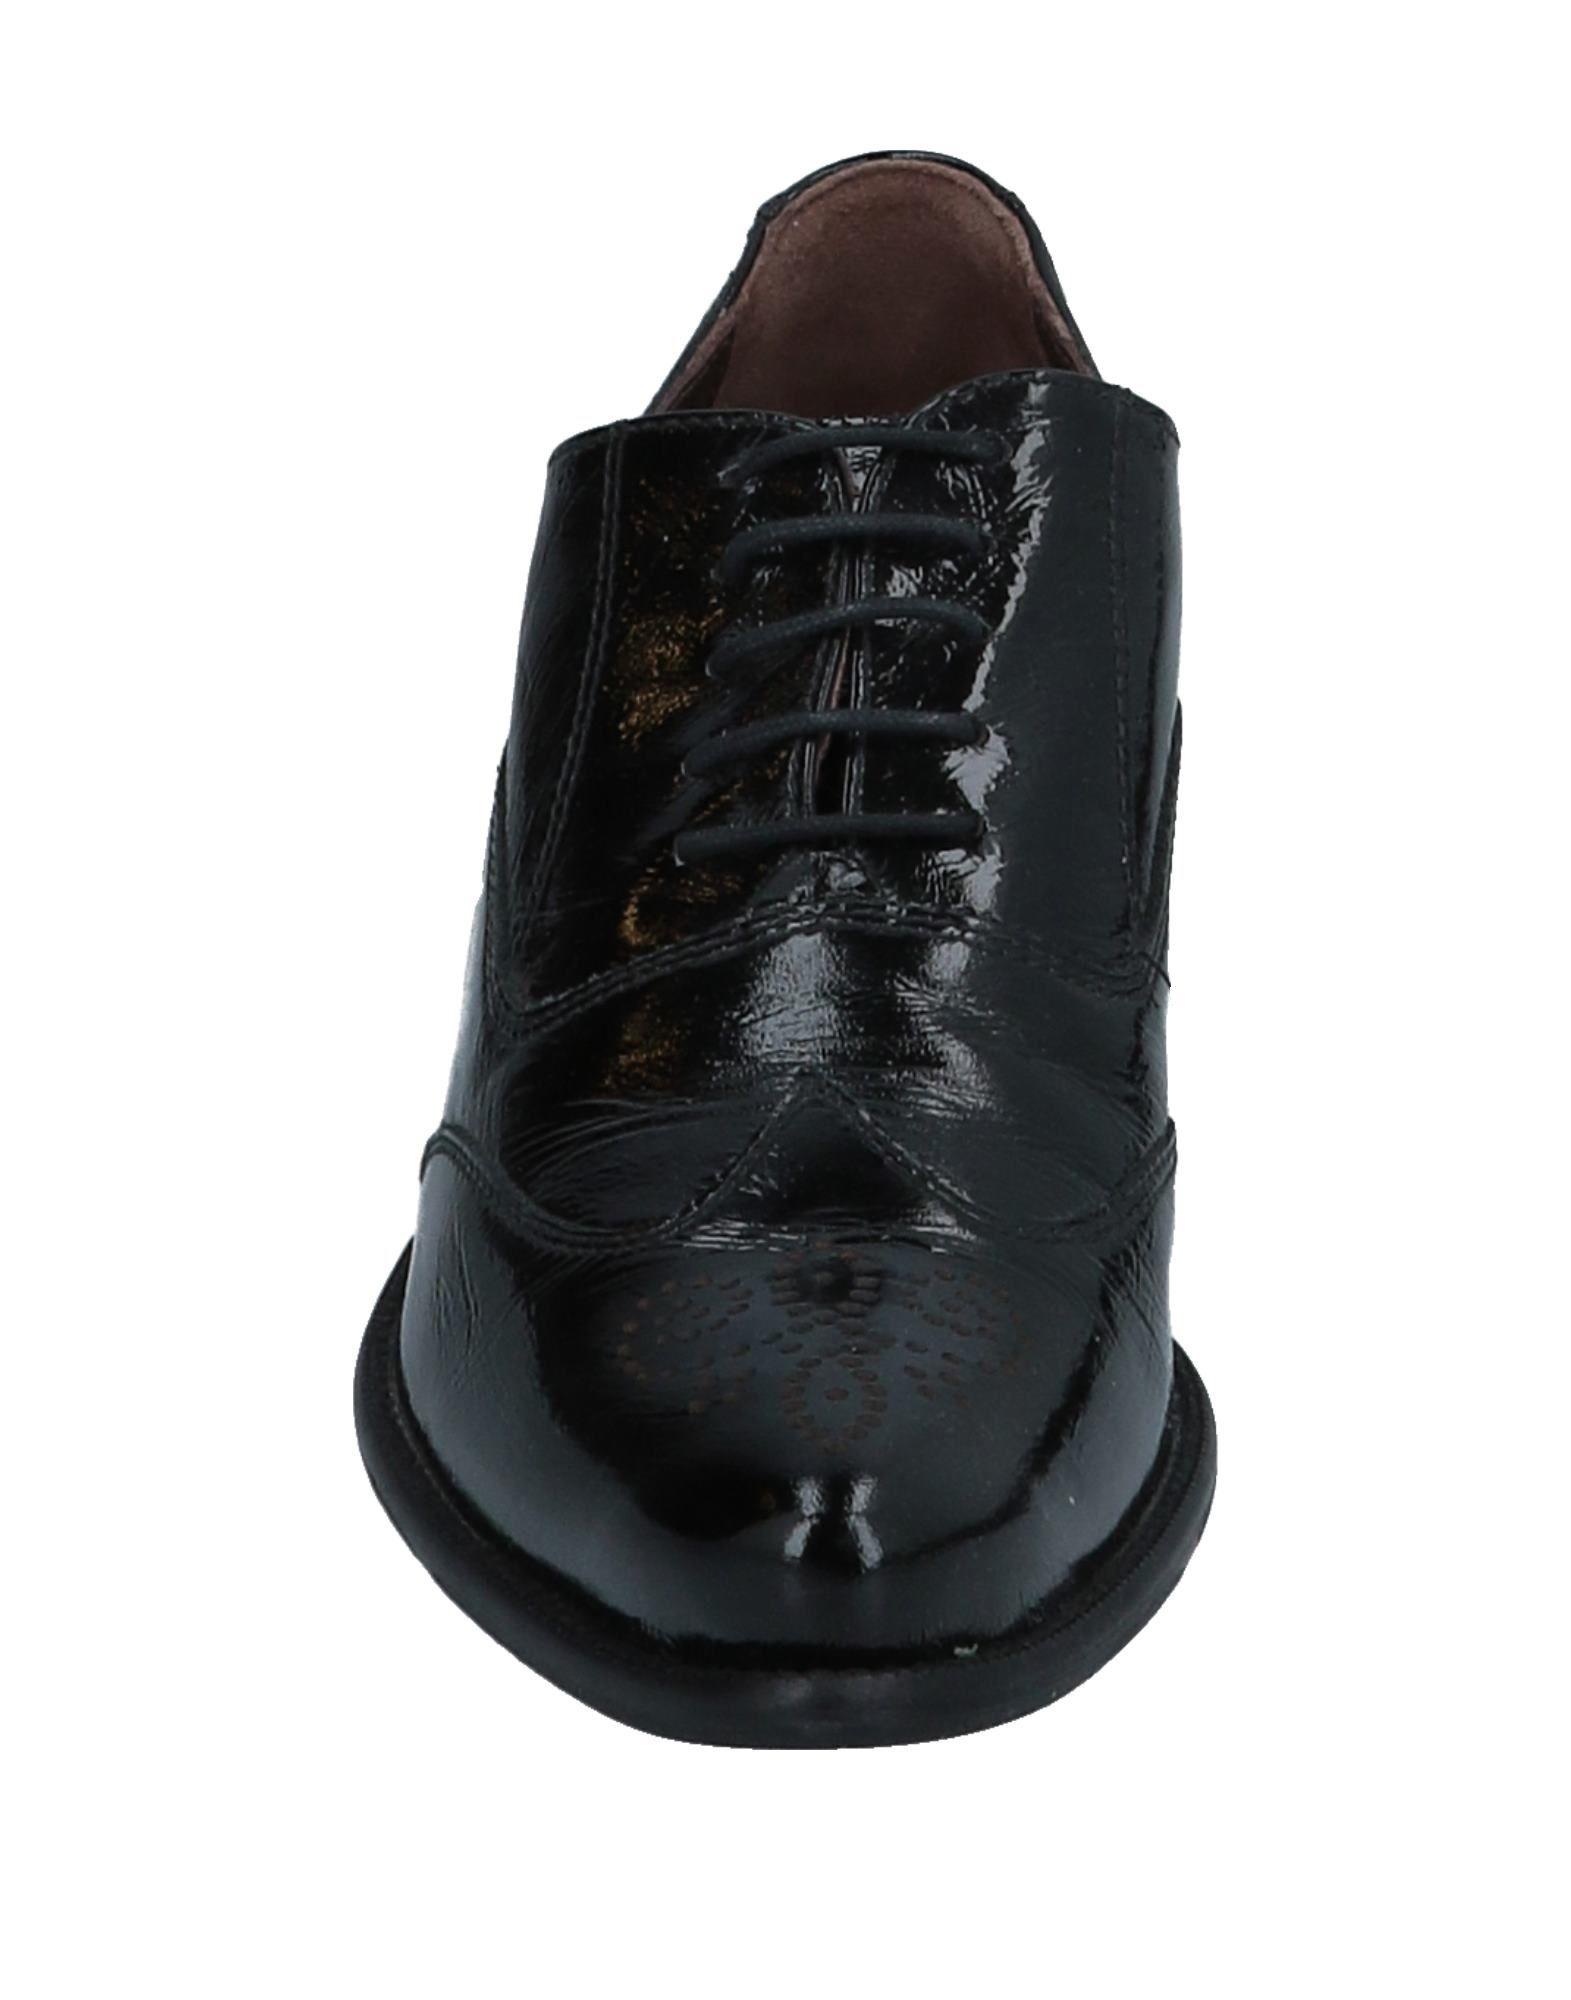 Gut um billige Schnürschuhe Schuhe zu tragenNero Giardini Schnürschuhe billige Damen  11508381BN 6cb06e